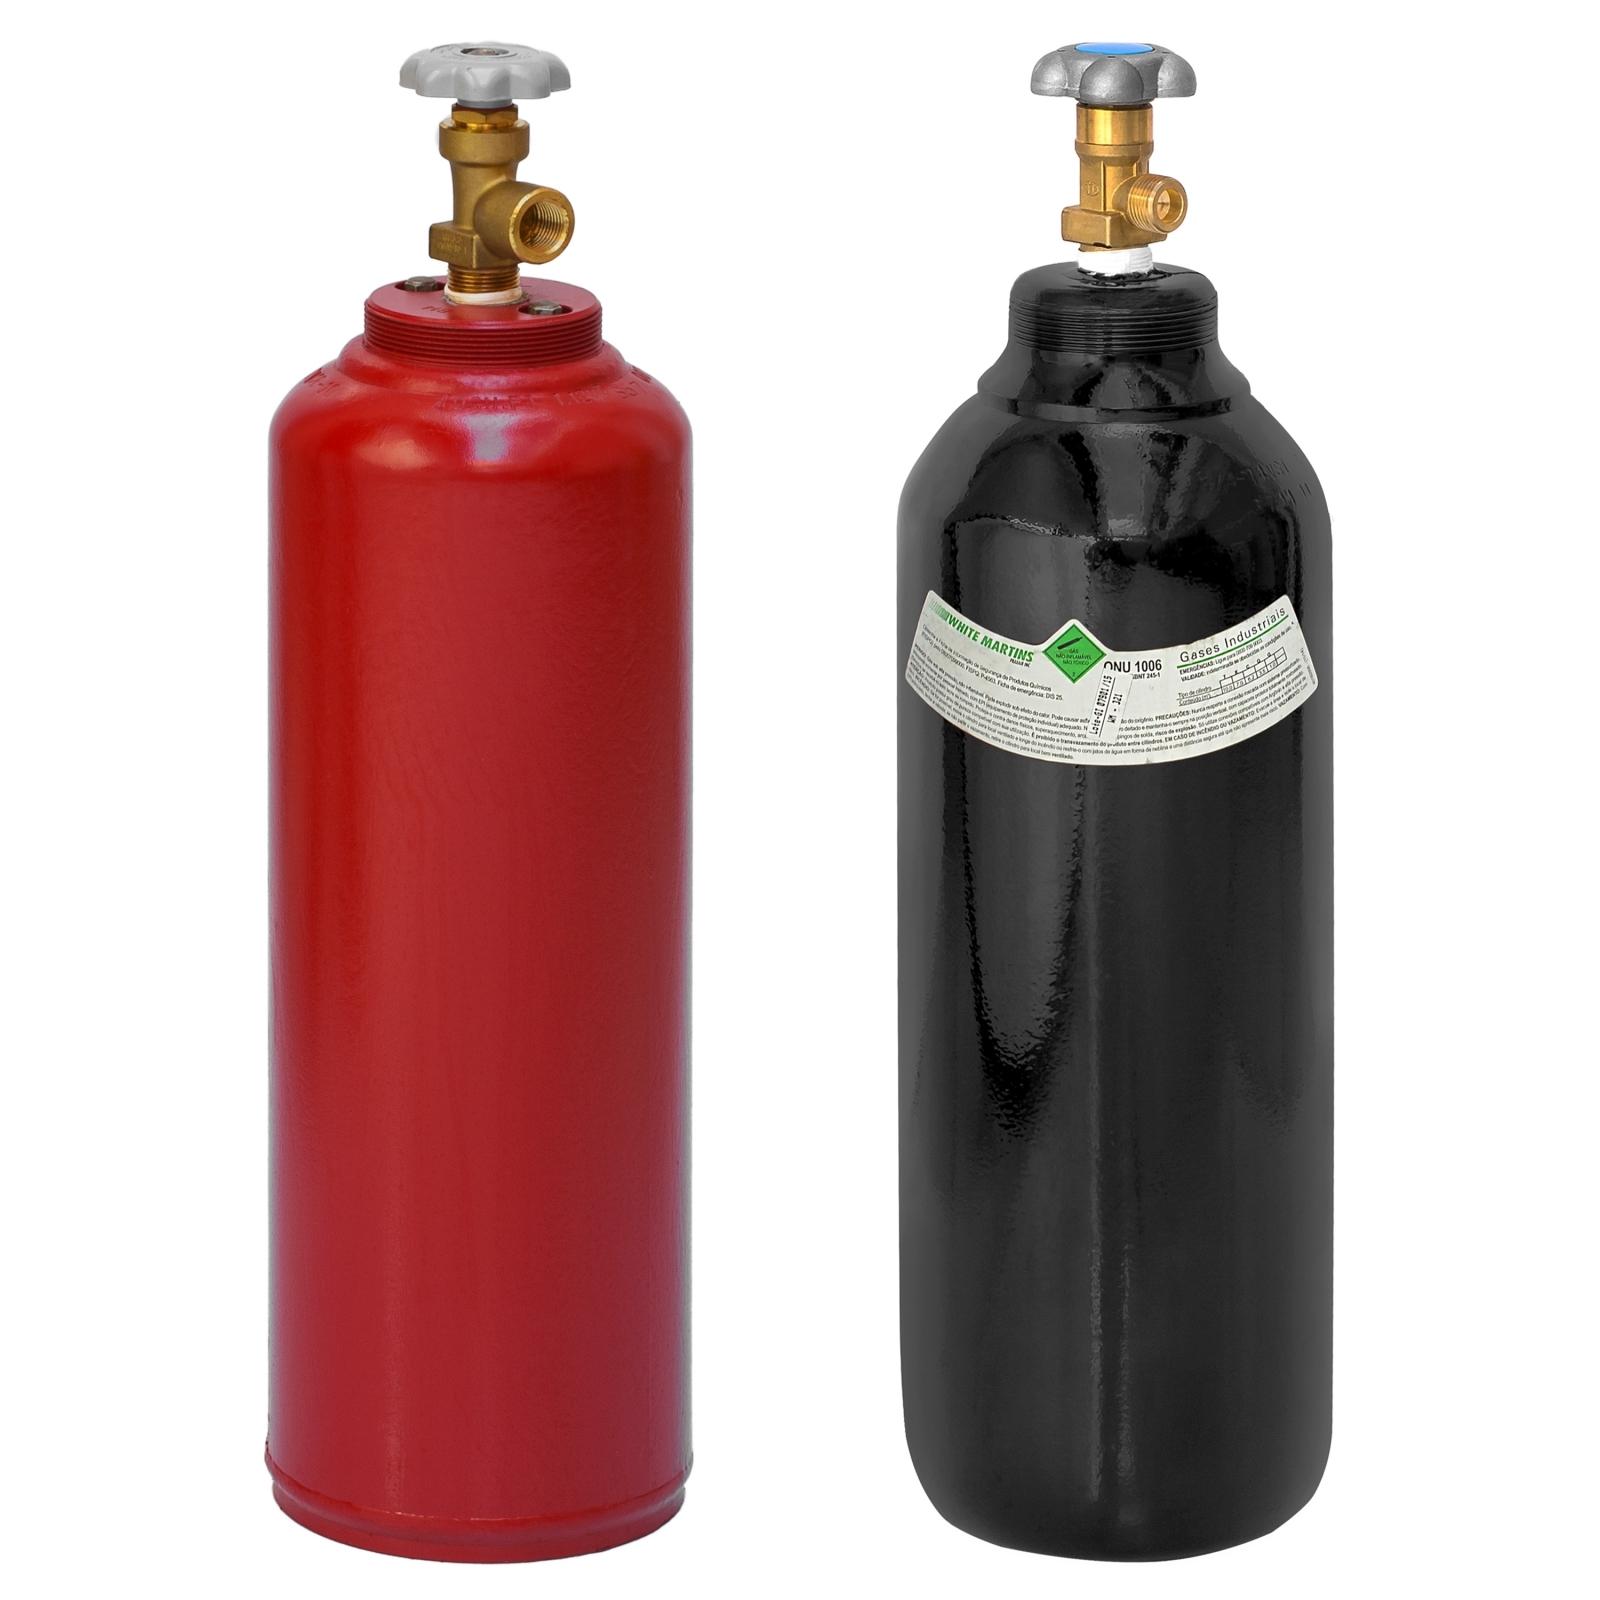 Conjunto de Solda Ppu Oxigênio e Acetileno Completo Pp6 - Ferramentas MEP